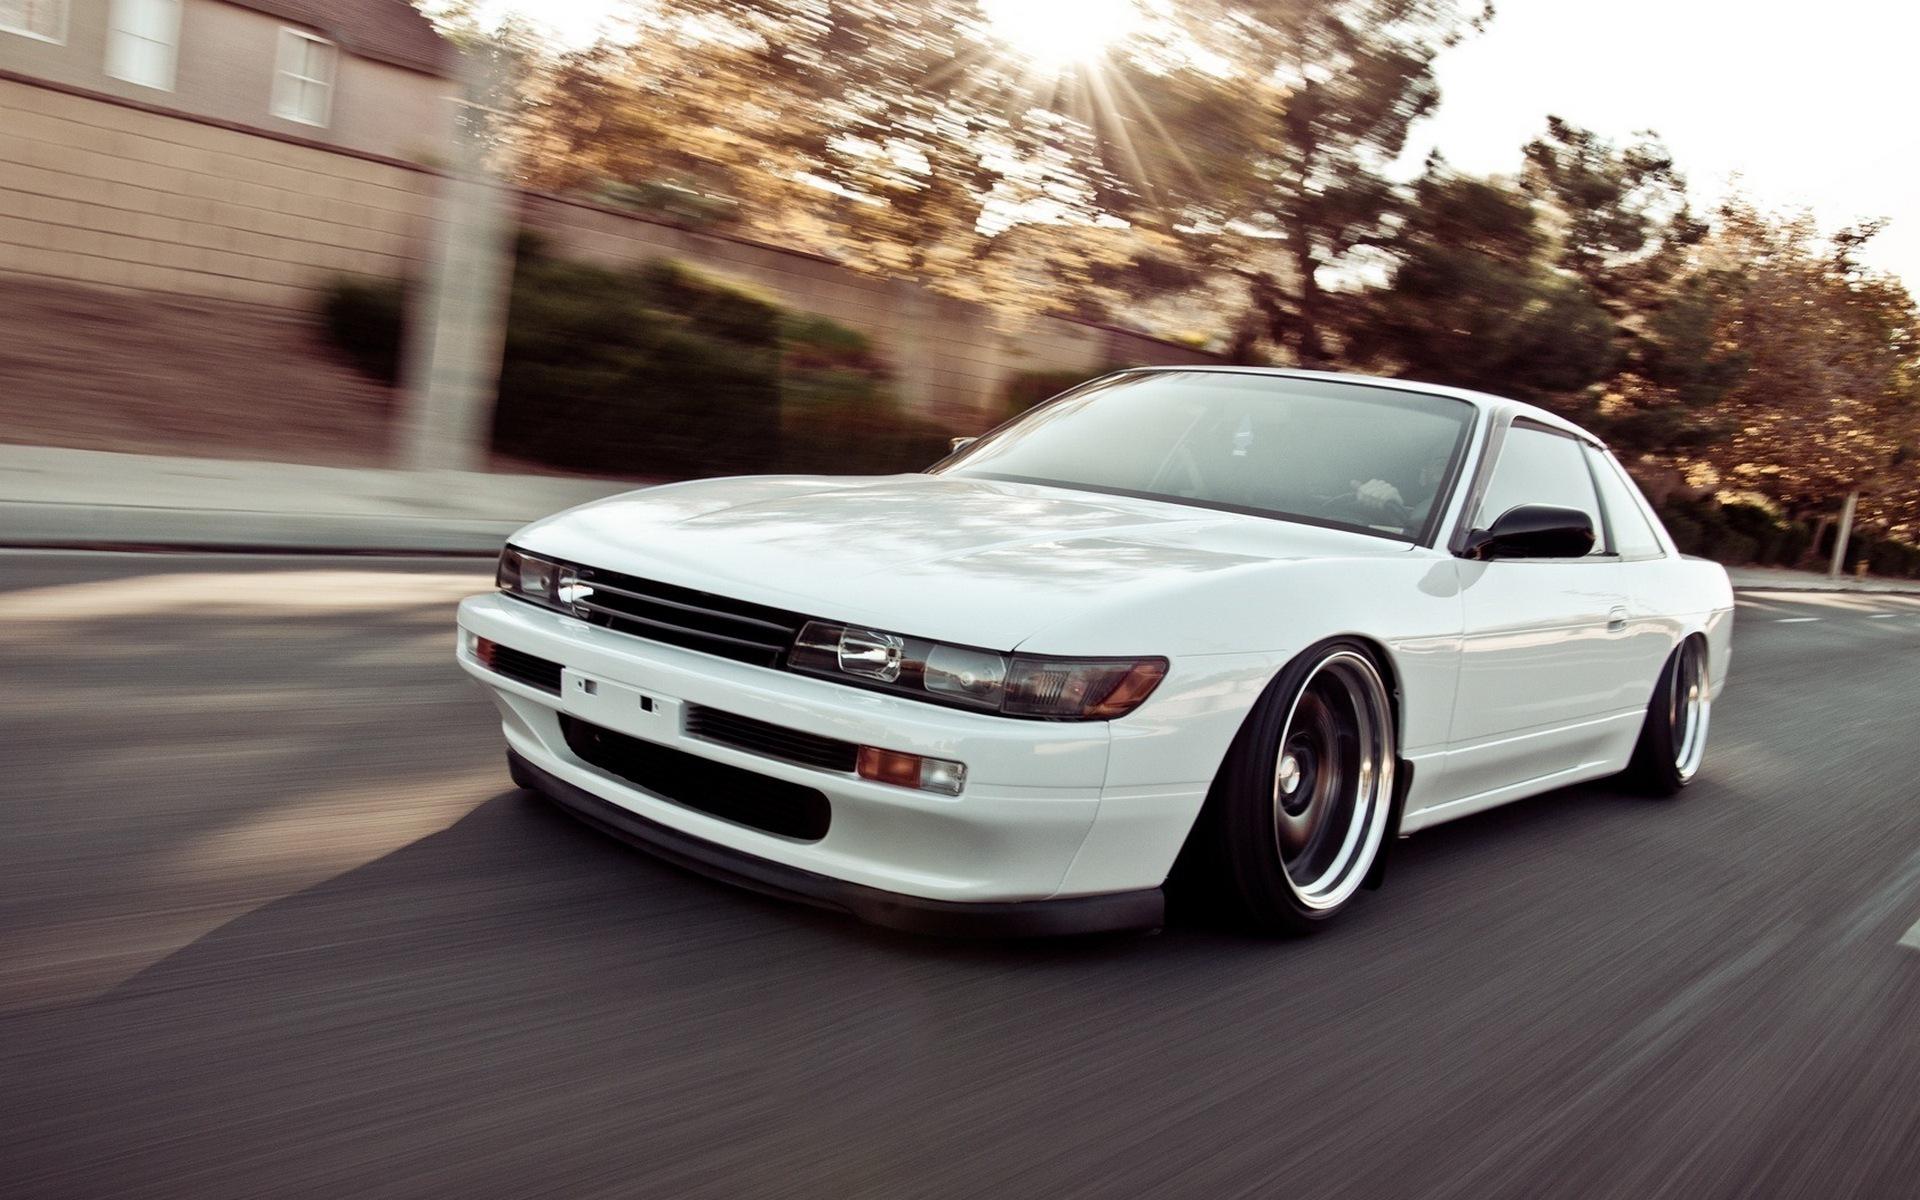 Nissan Silvia S13 Photo